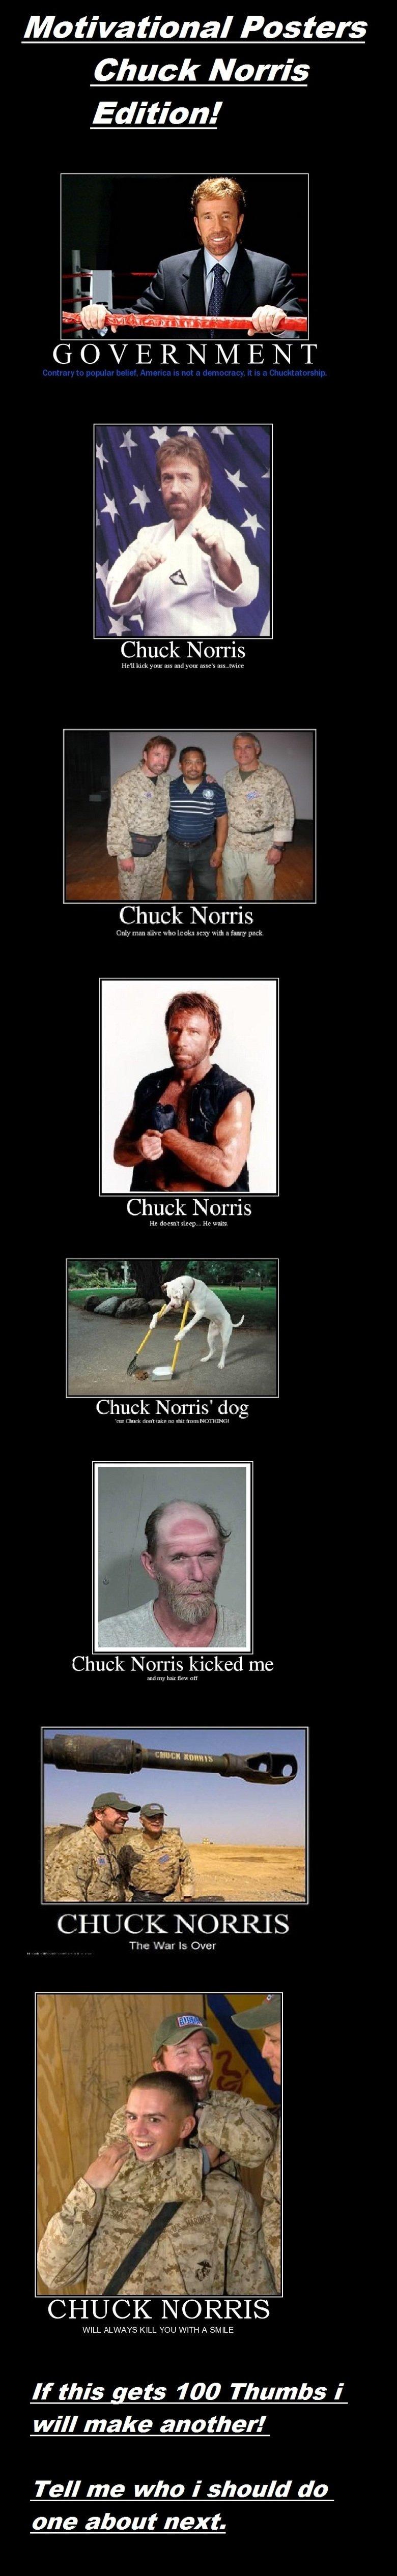 Chuck Norris!. Chuck Norris demands more thumbs!. Motivational Posters Chuck Norris Edition.' Chuck mu Luk yum Chuck Norris Chuck Norris' dog Chck Norris heed m Chuck Norris! Norris demands more thumbs! Motivational Posters Edition ' mu Luk yum Norris' dog Chck heed m